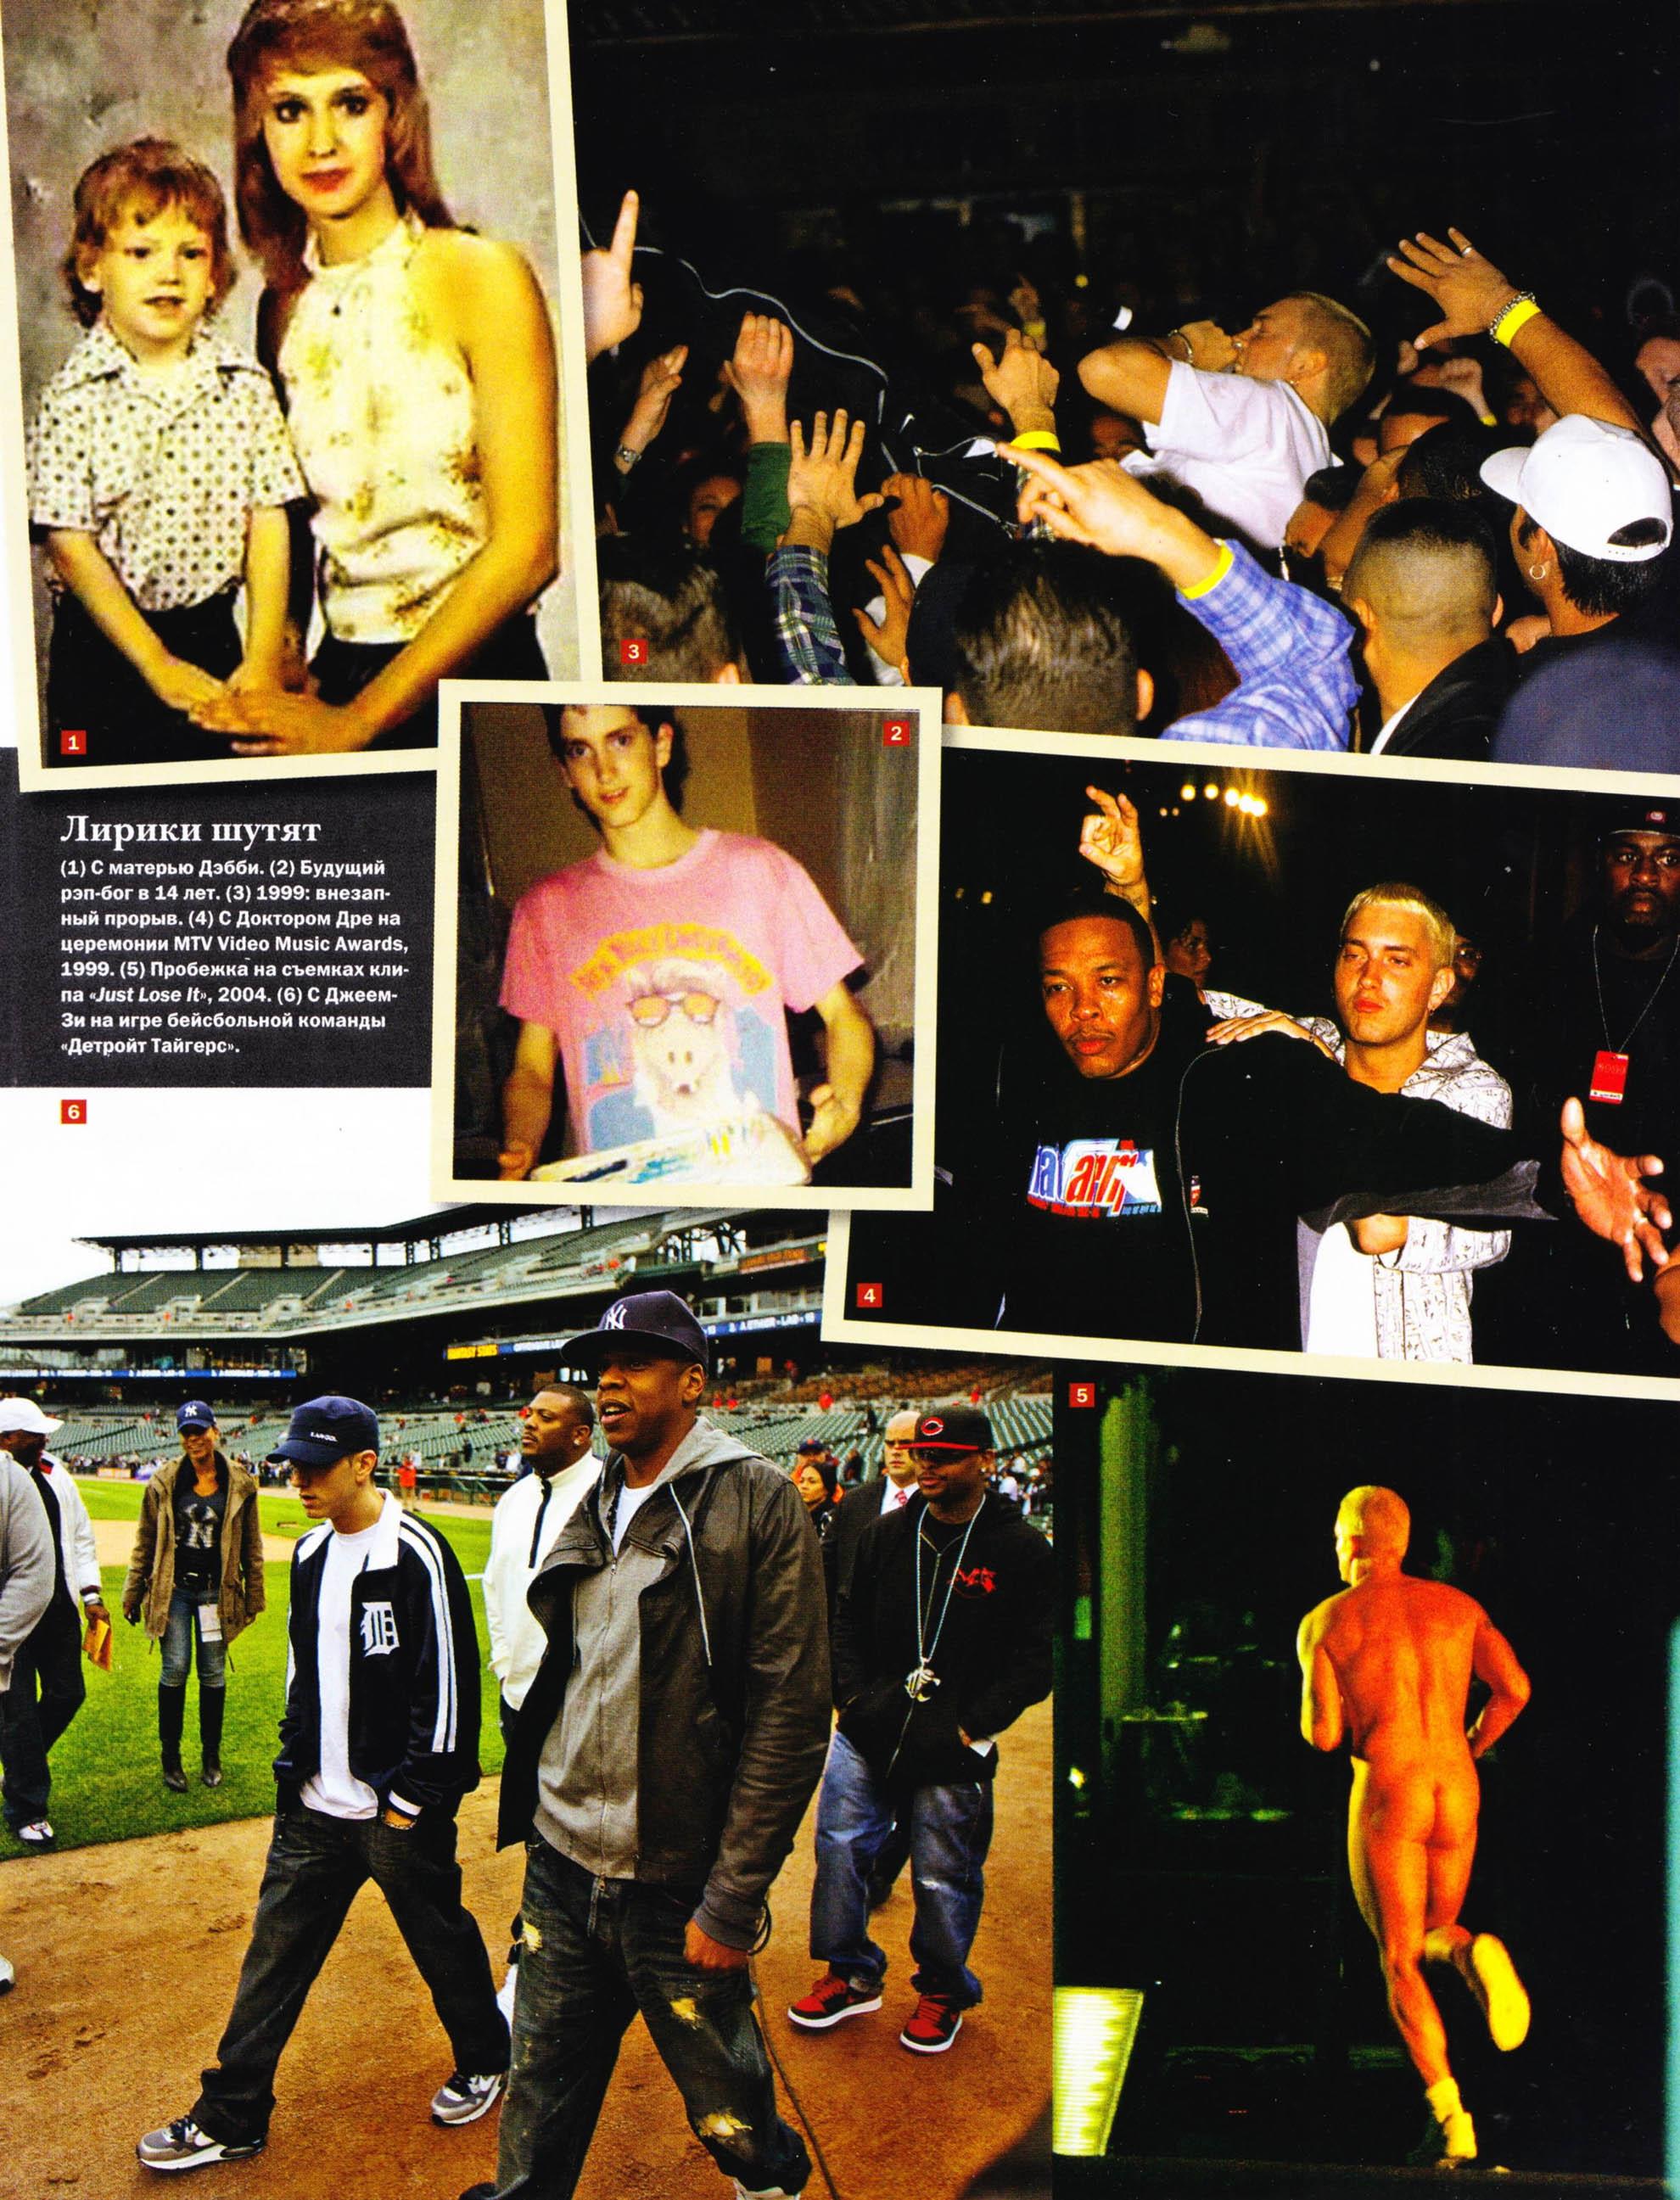 Rolling Stone Eminem December 5, 2013